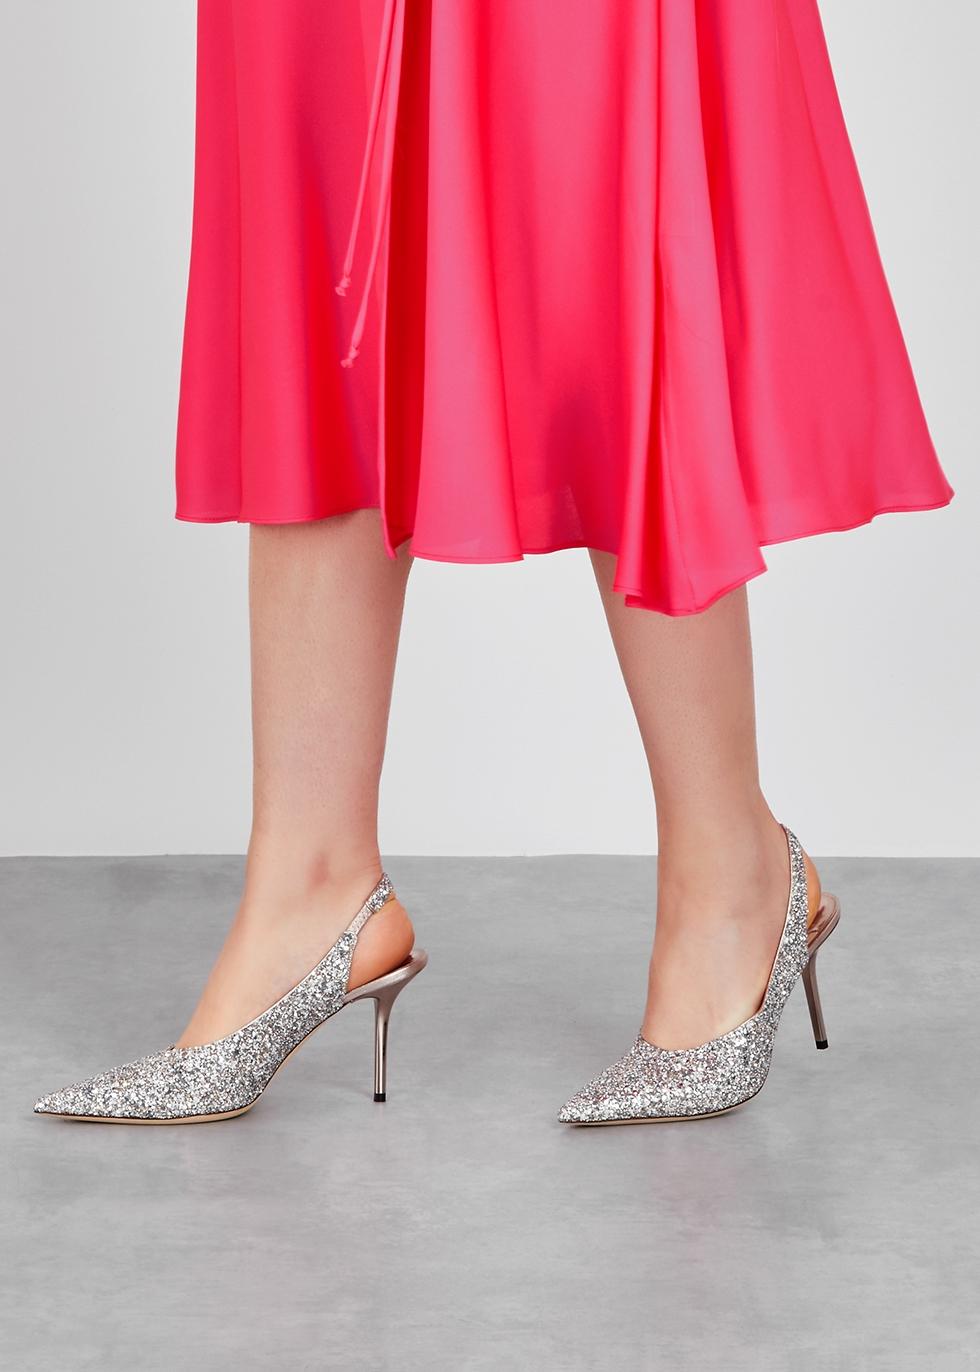 702badba17780 Jimmy Choo Shoes - Womens - Harvey Nichols